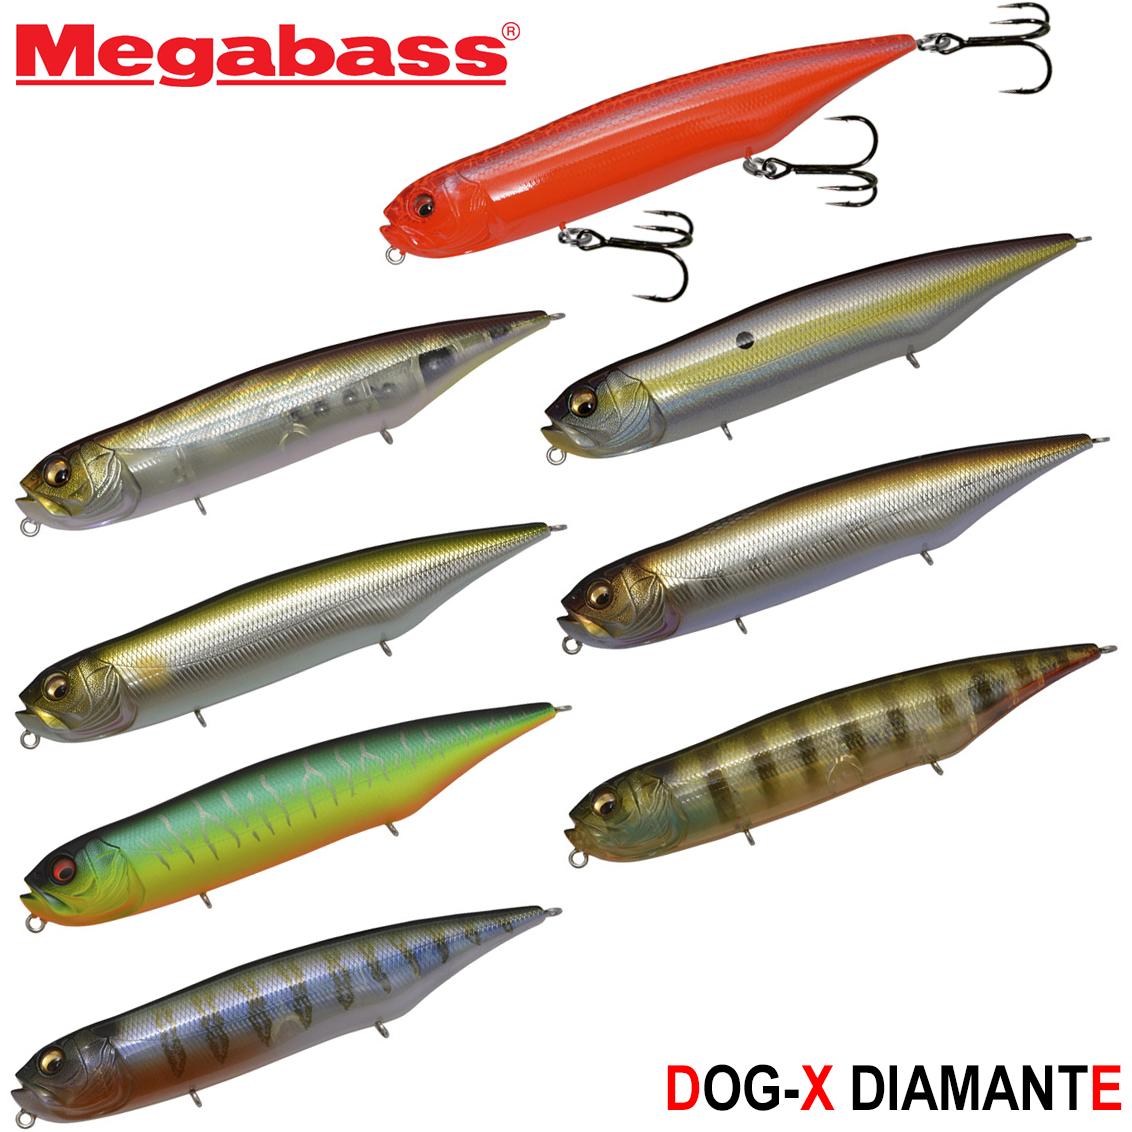 Megabass Dog X Diamante